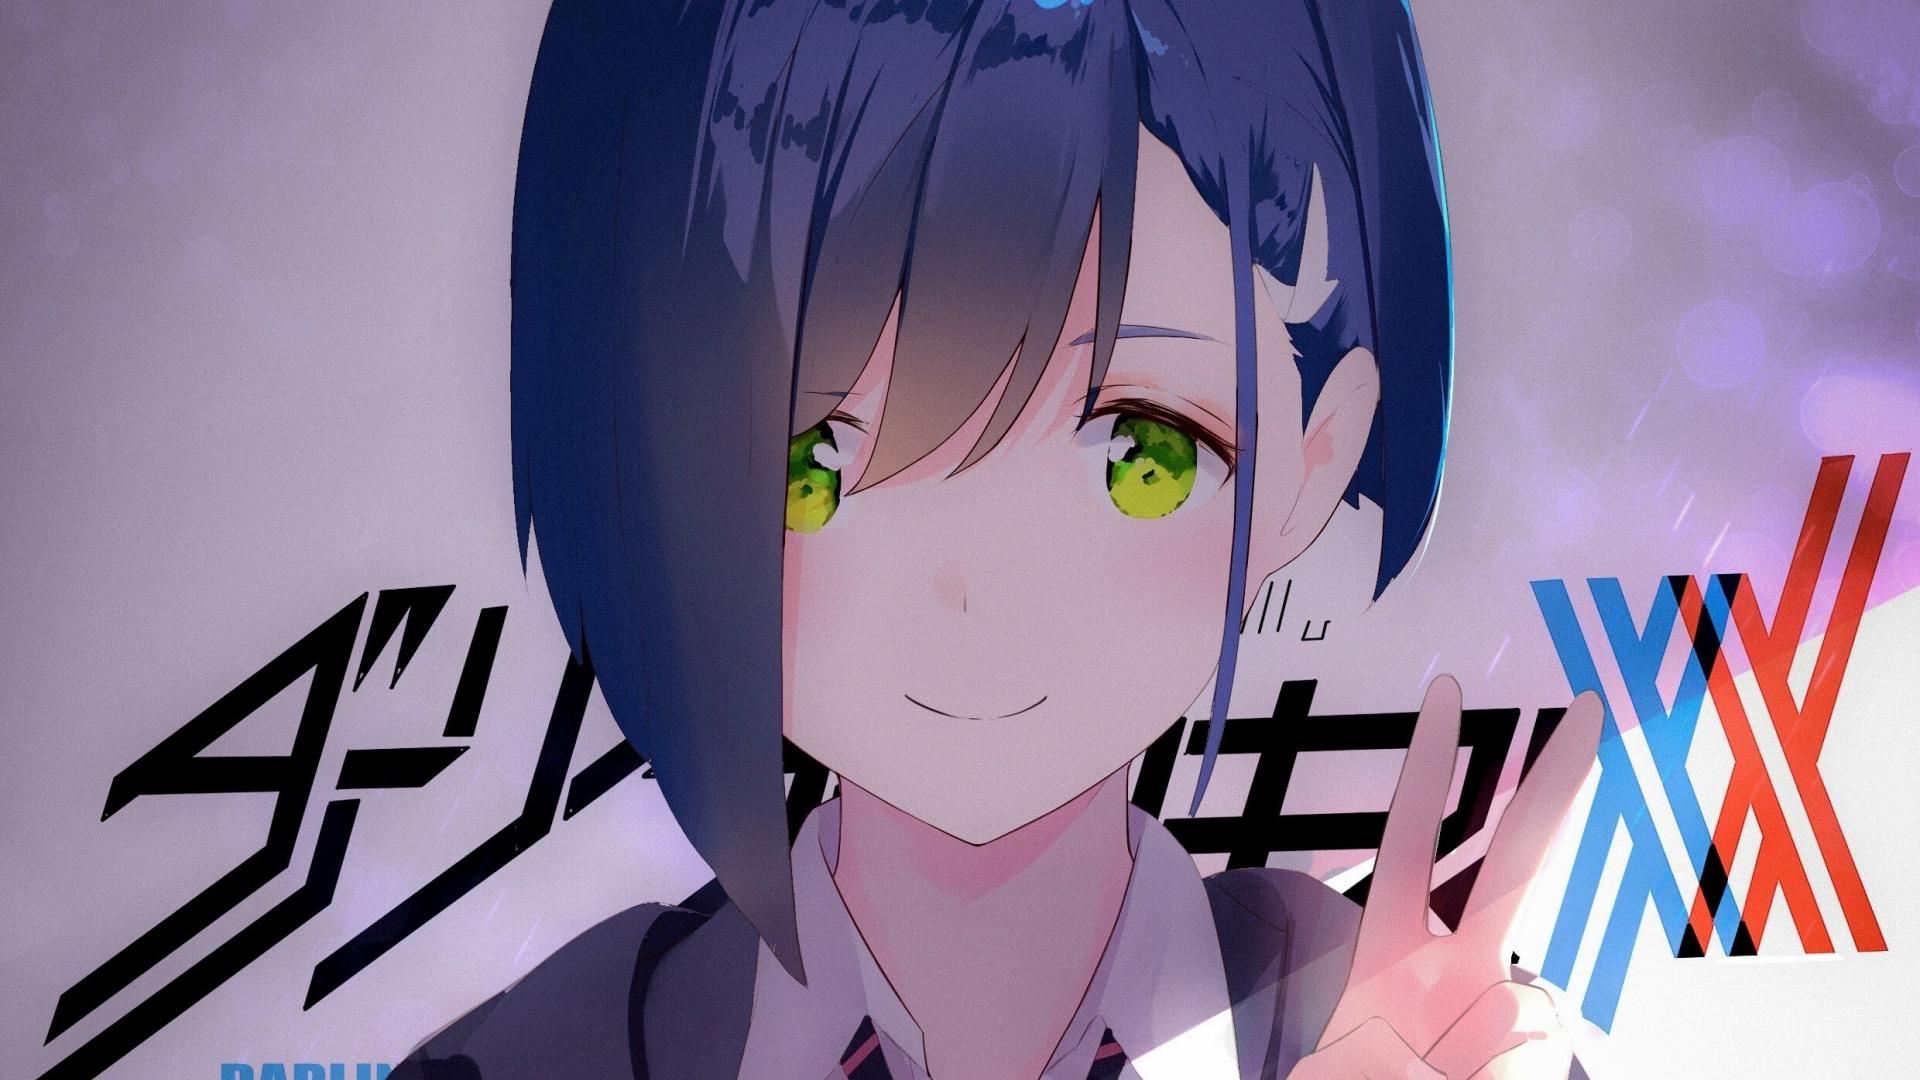 Download 1920x1080 Wallpaper Cute Eyes Ichigo Blue Hair Short